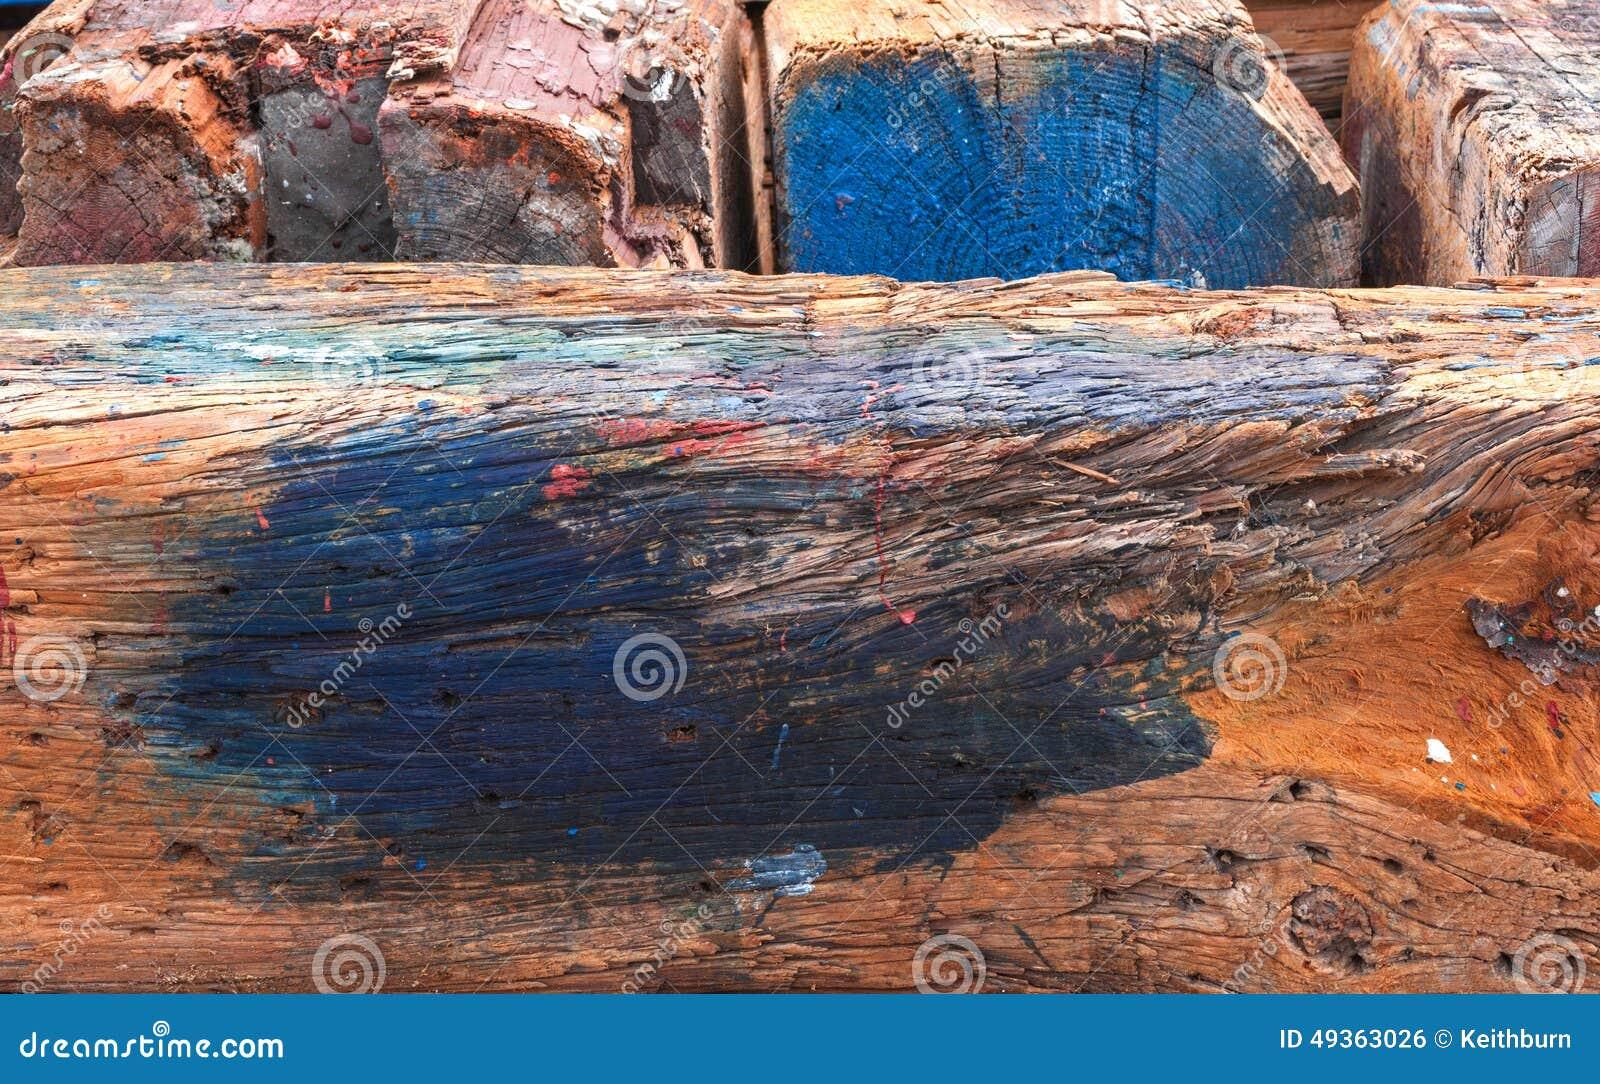 Doorstaan hout met verfvlekken achtergrond stock foto afbeelding 49363026 - Hout verfvlek ...